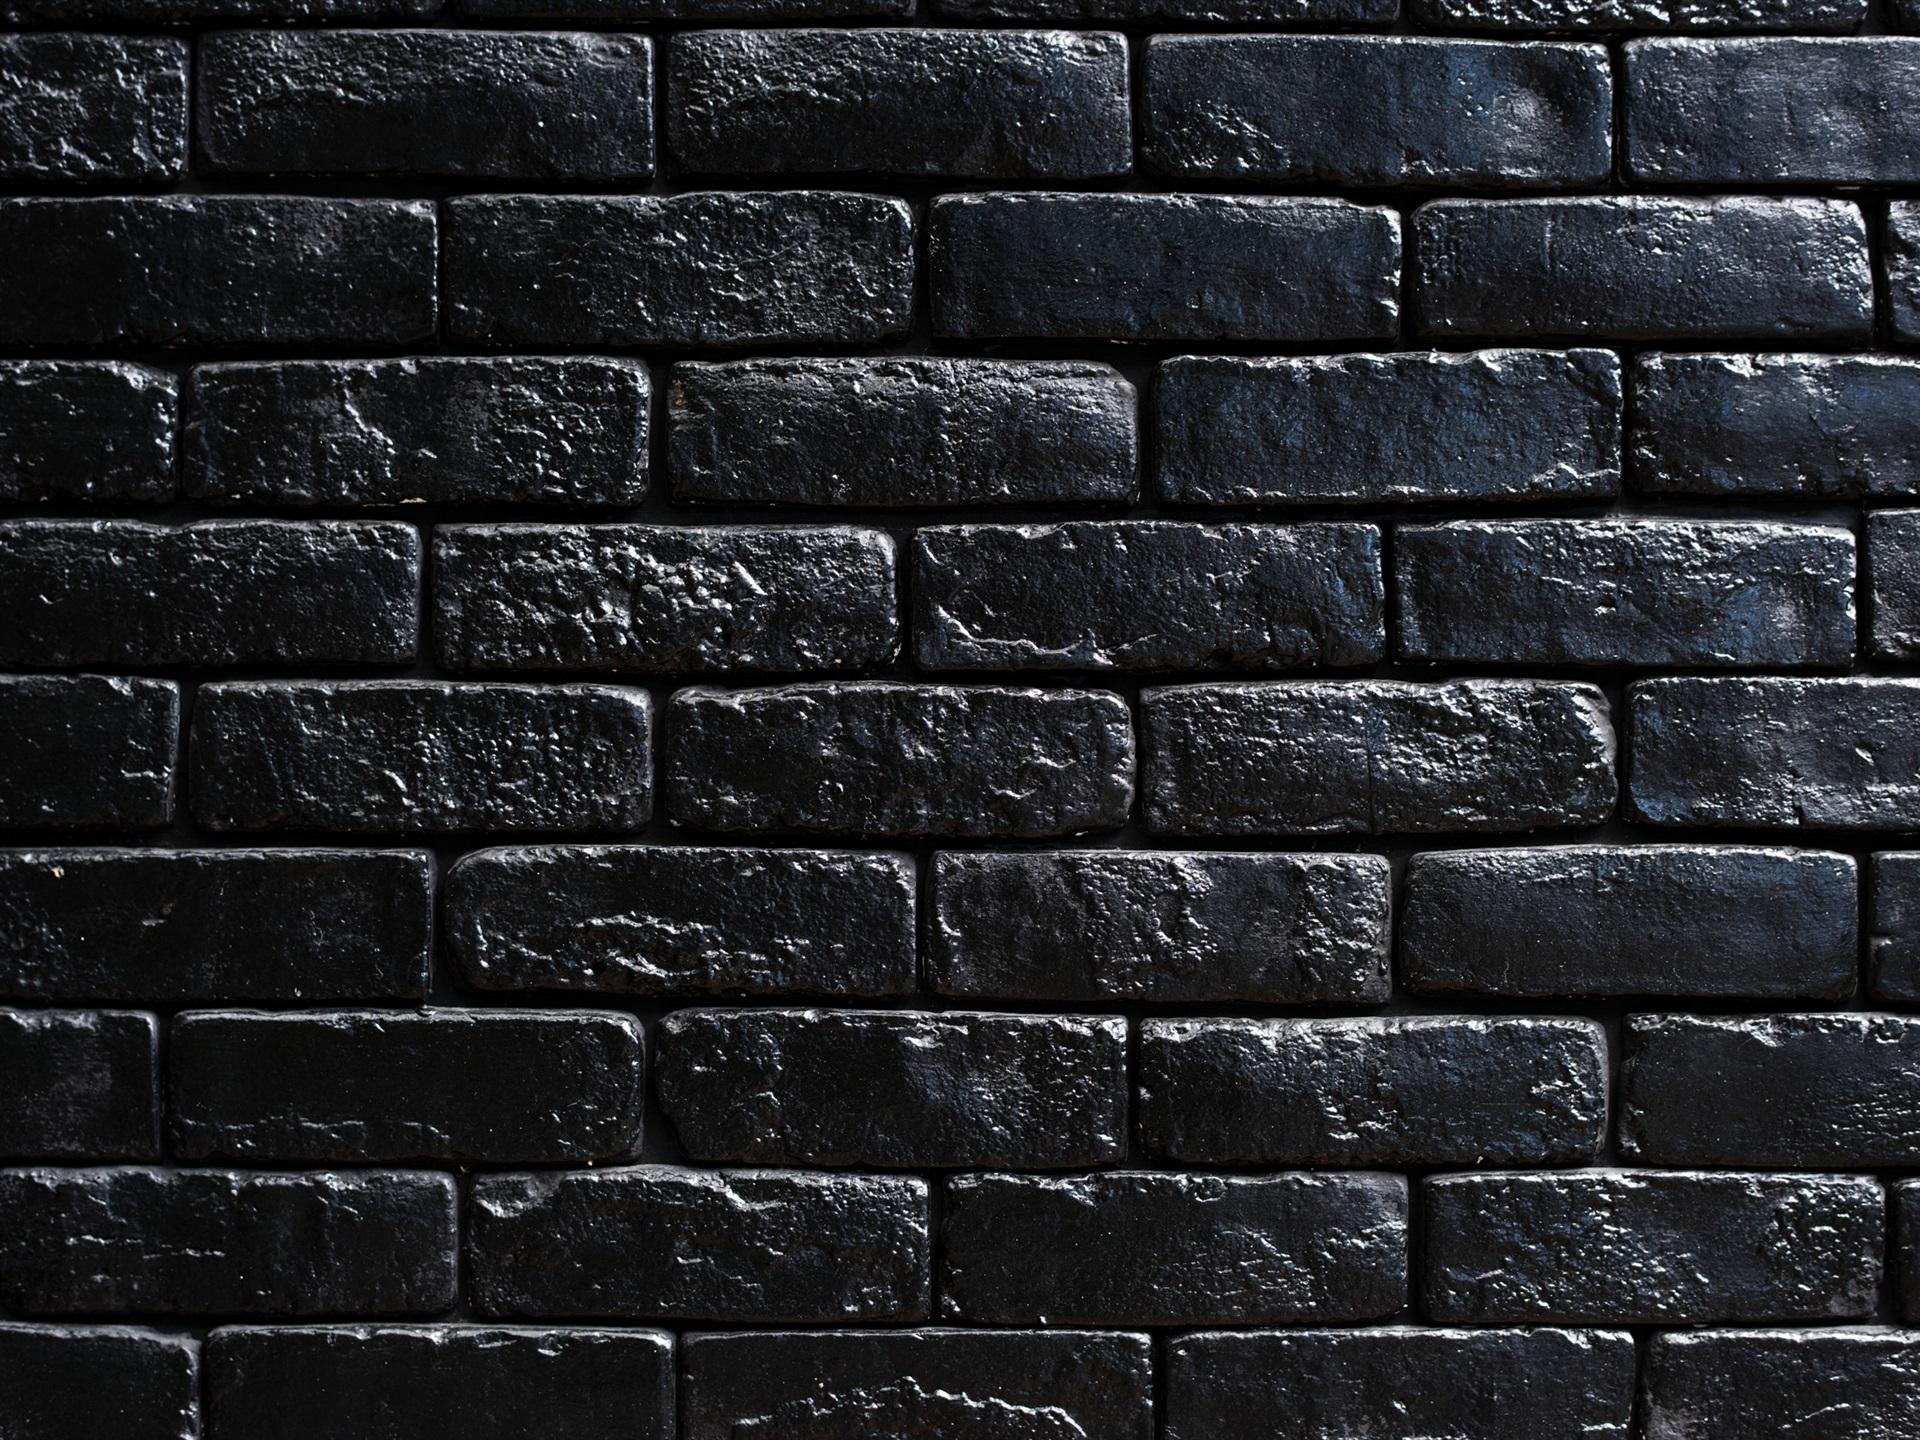 Fondos De Pantalla Negros: Fondos De Pantalla Pared De Ladrillos Negros 1920x1440 HD